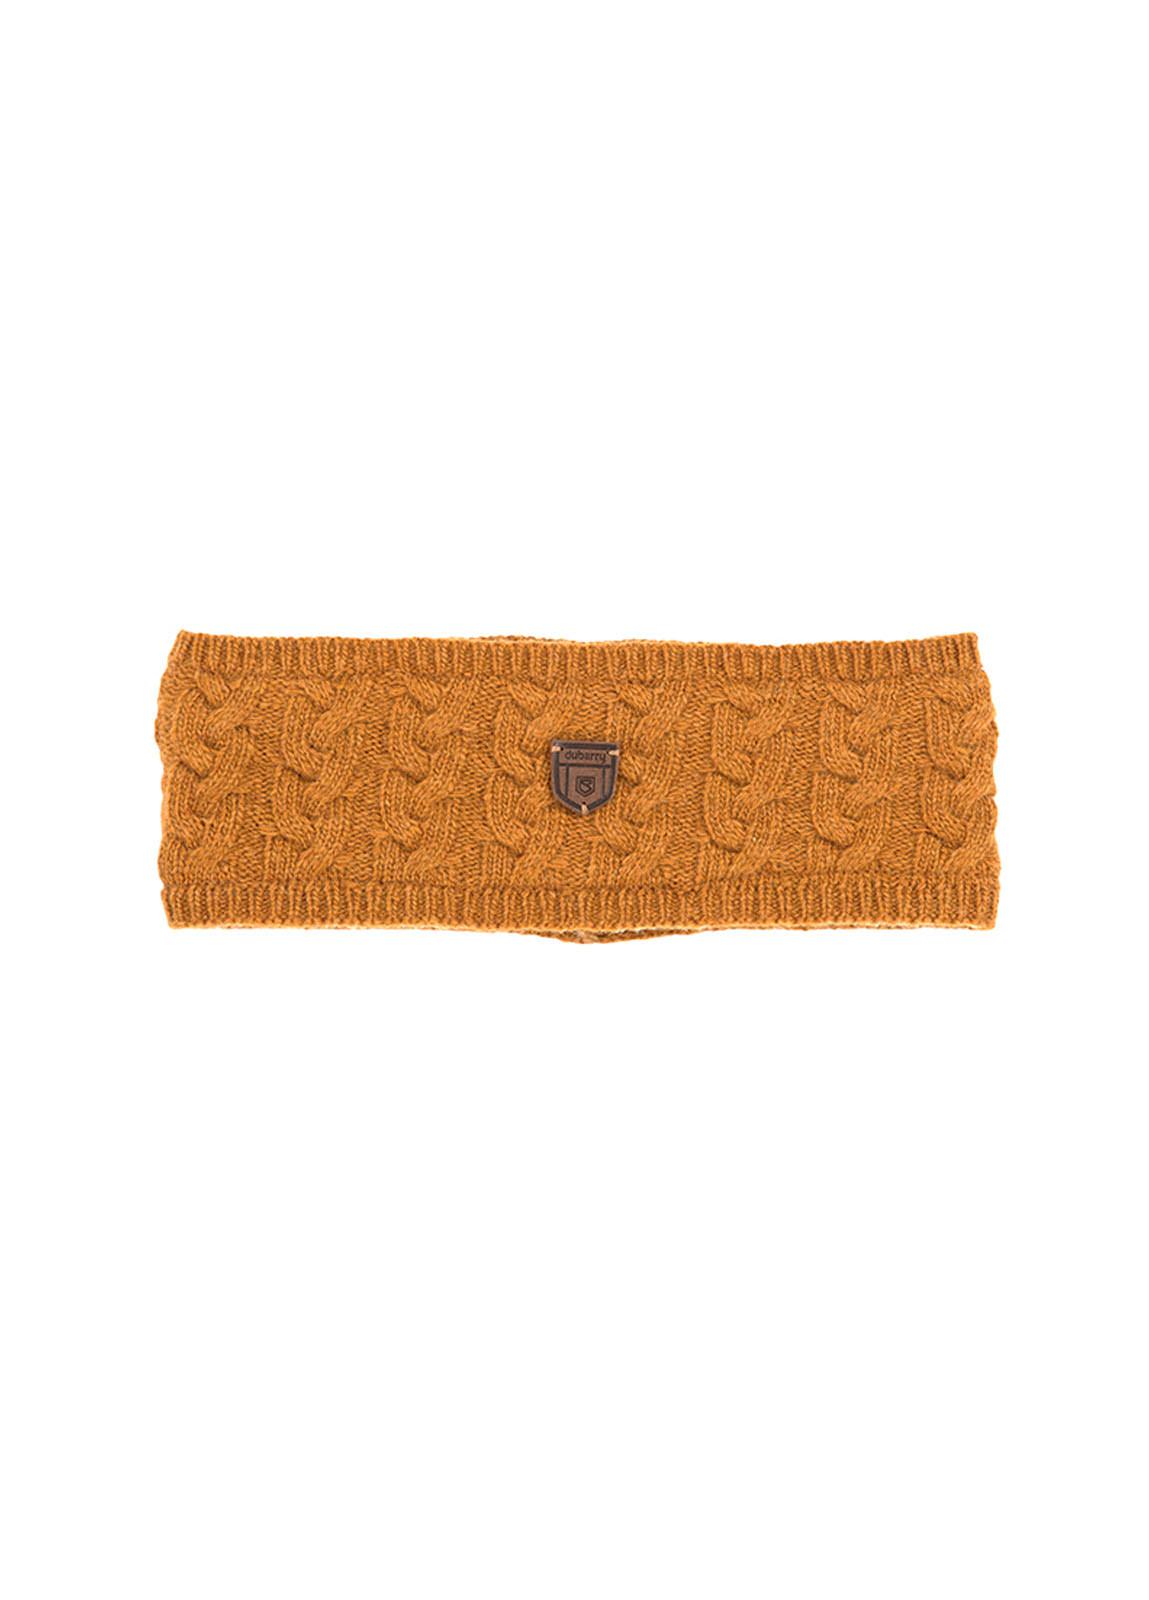 Dubarry_ Farmleigh Knitted Headband - Mustard_Image_1